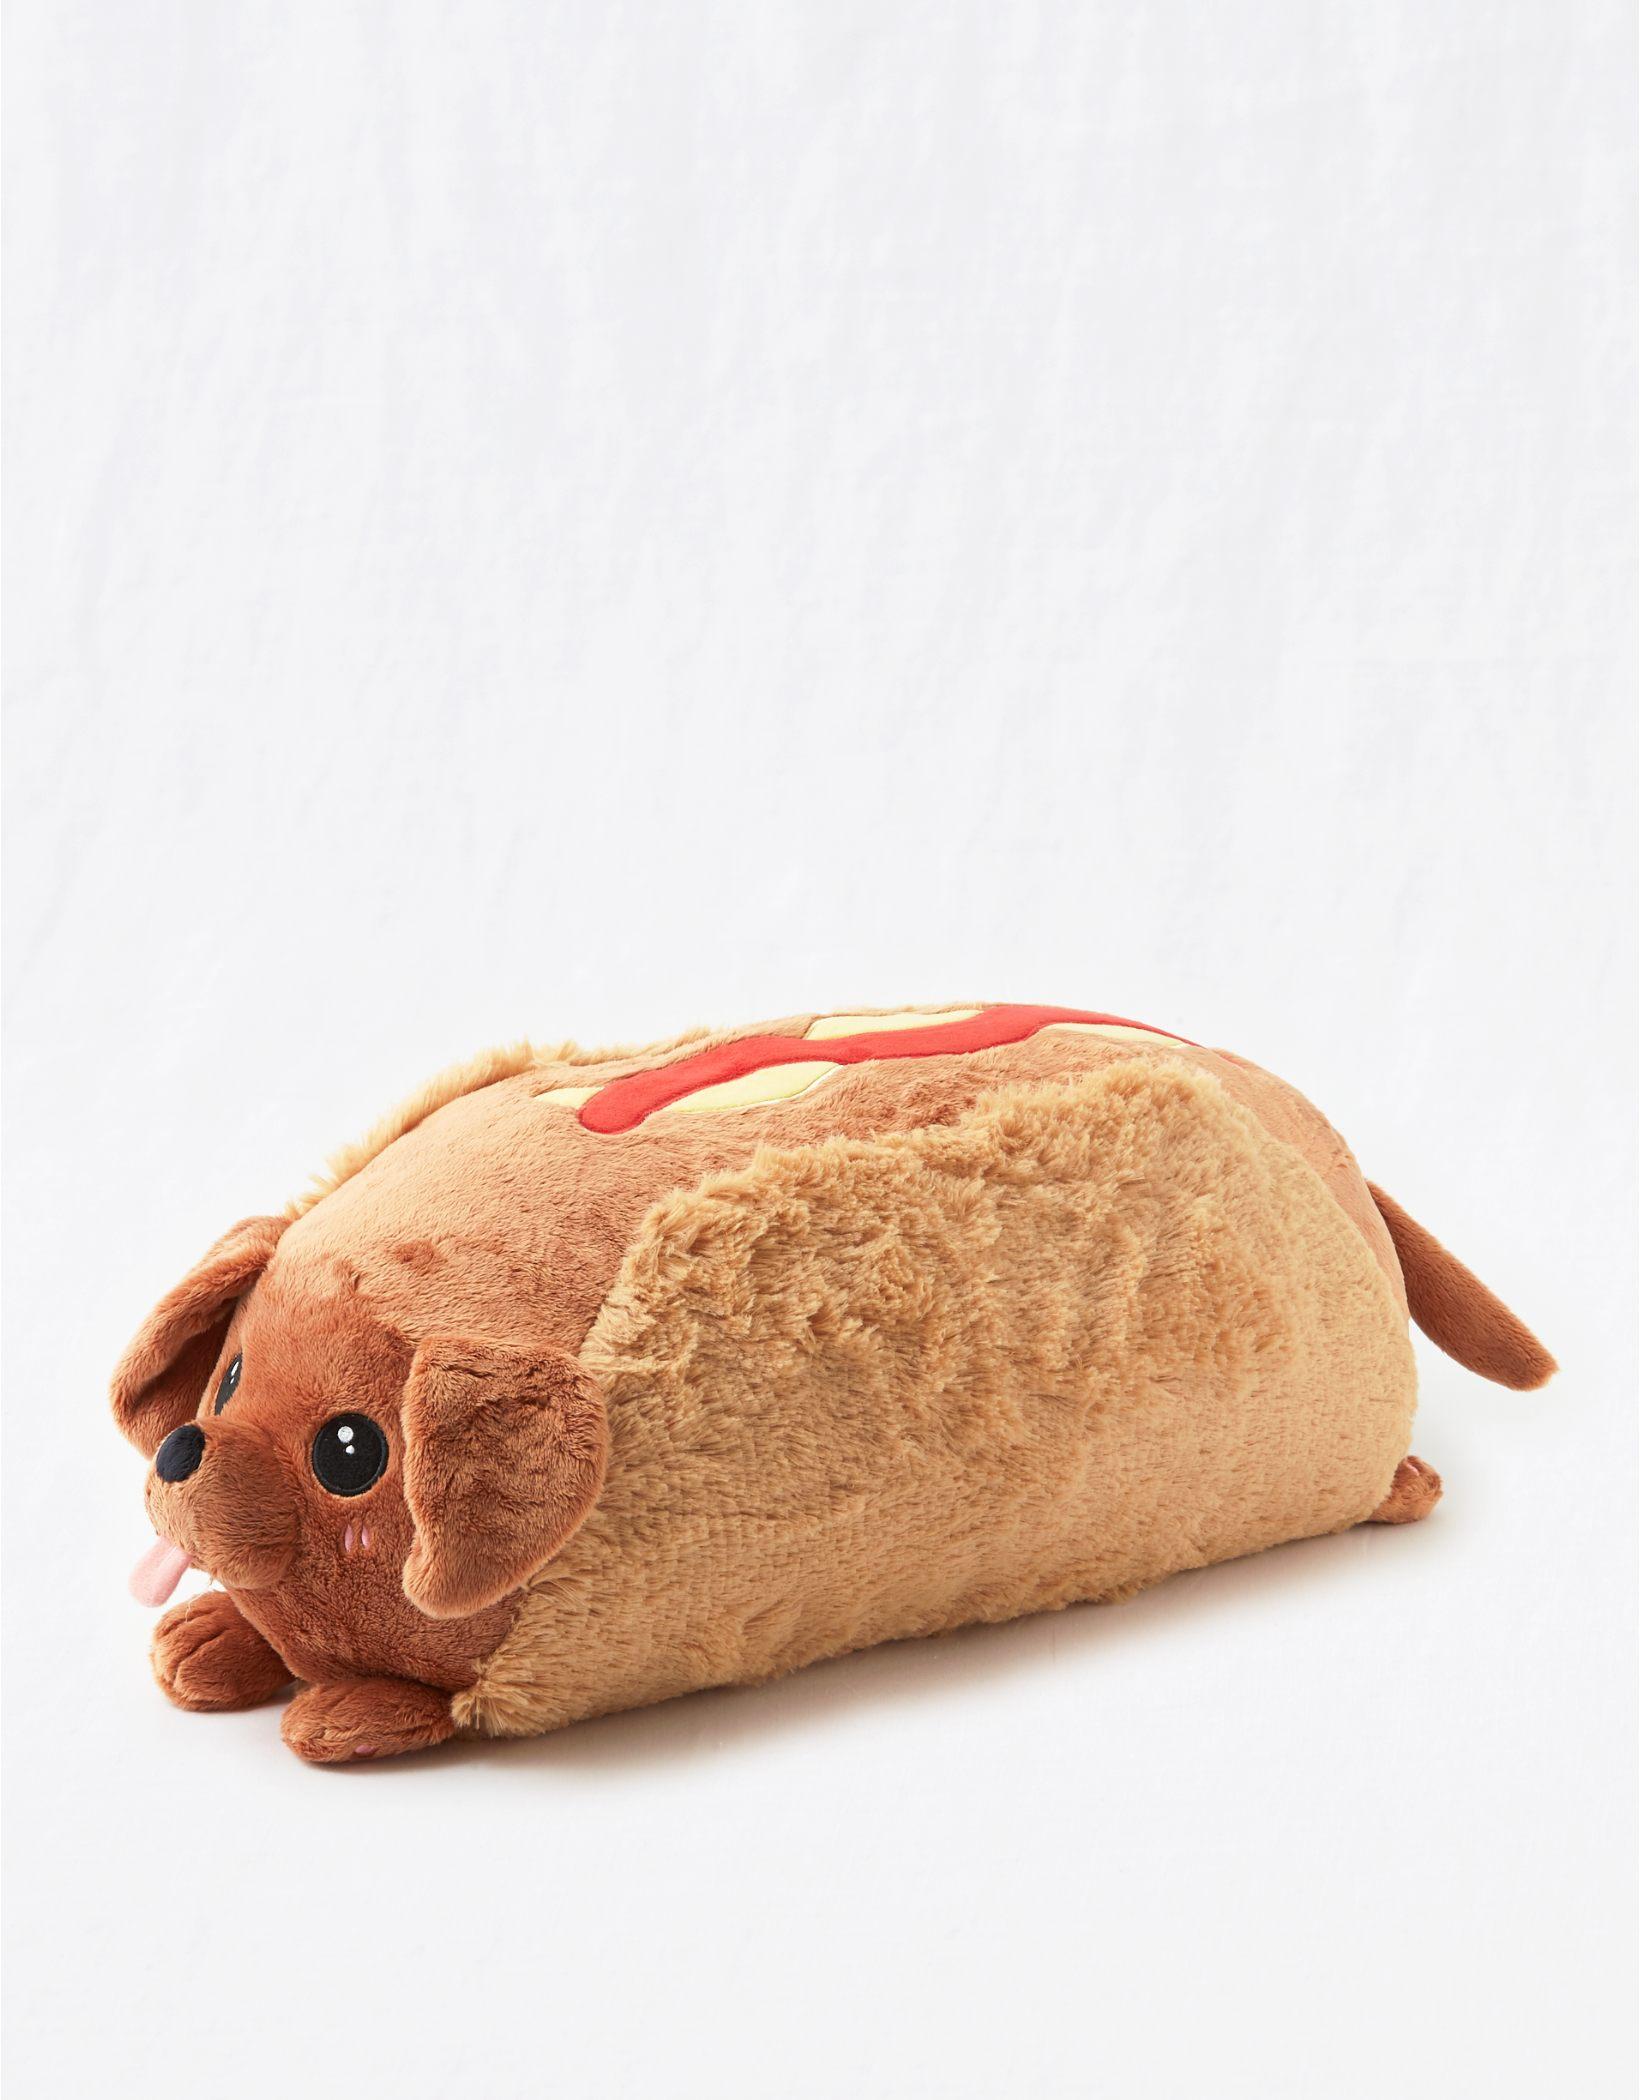 Squishable Daschund Hot Dog Pillow